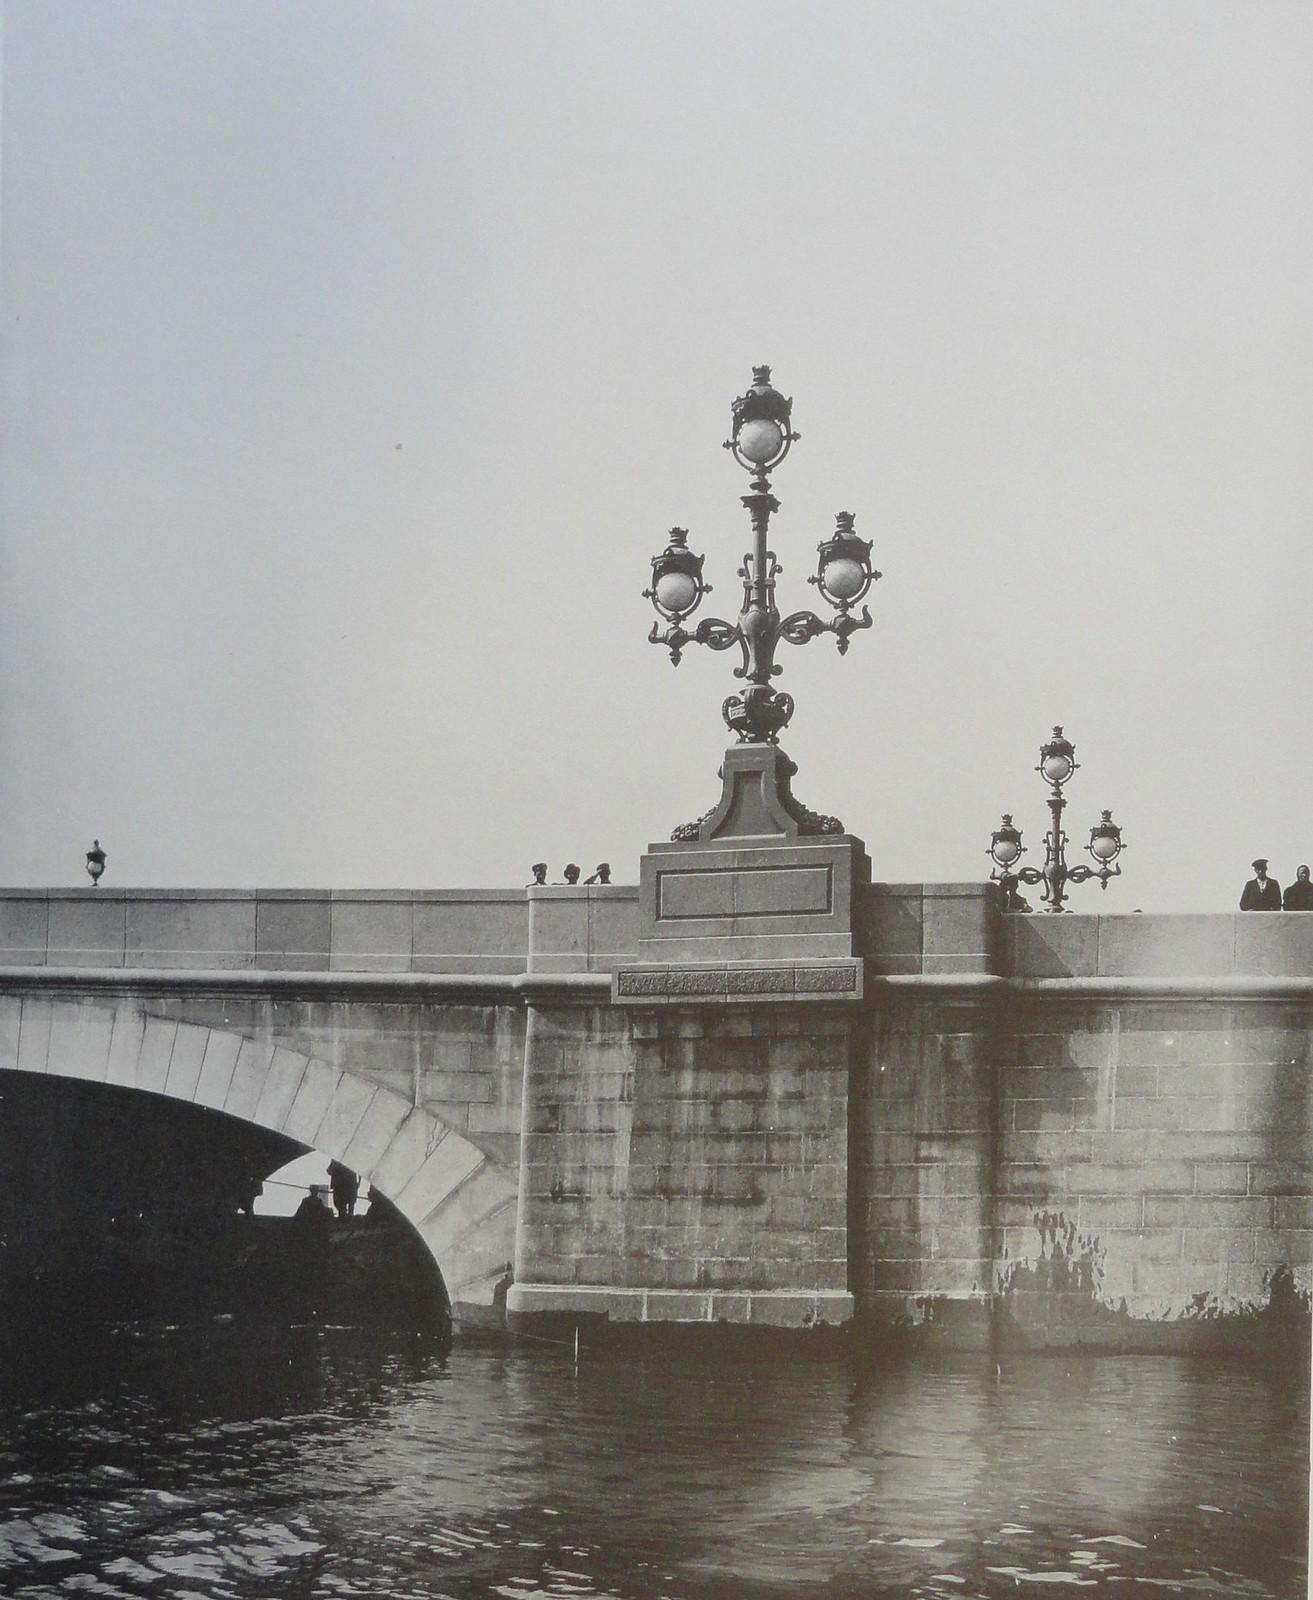 1903. Правый устой дамбы. 15 мая